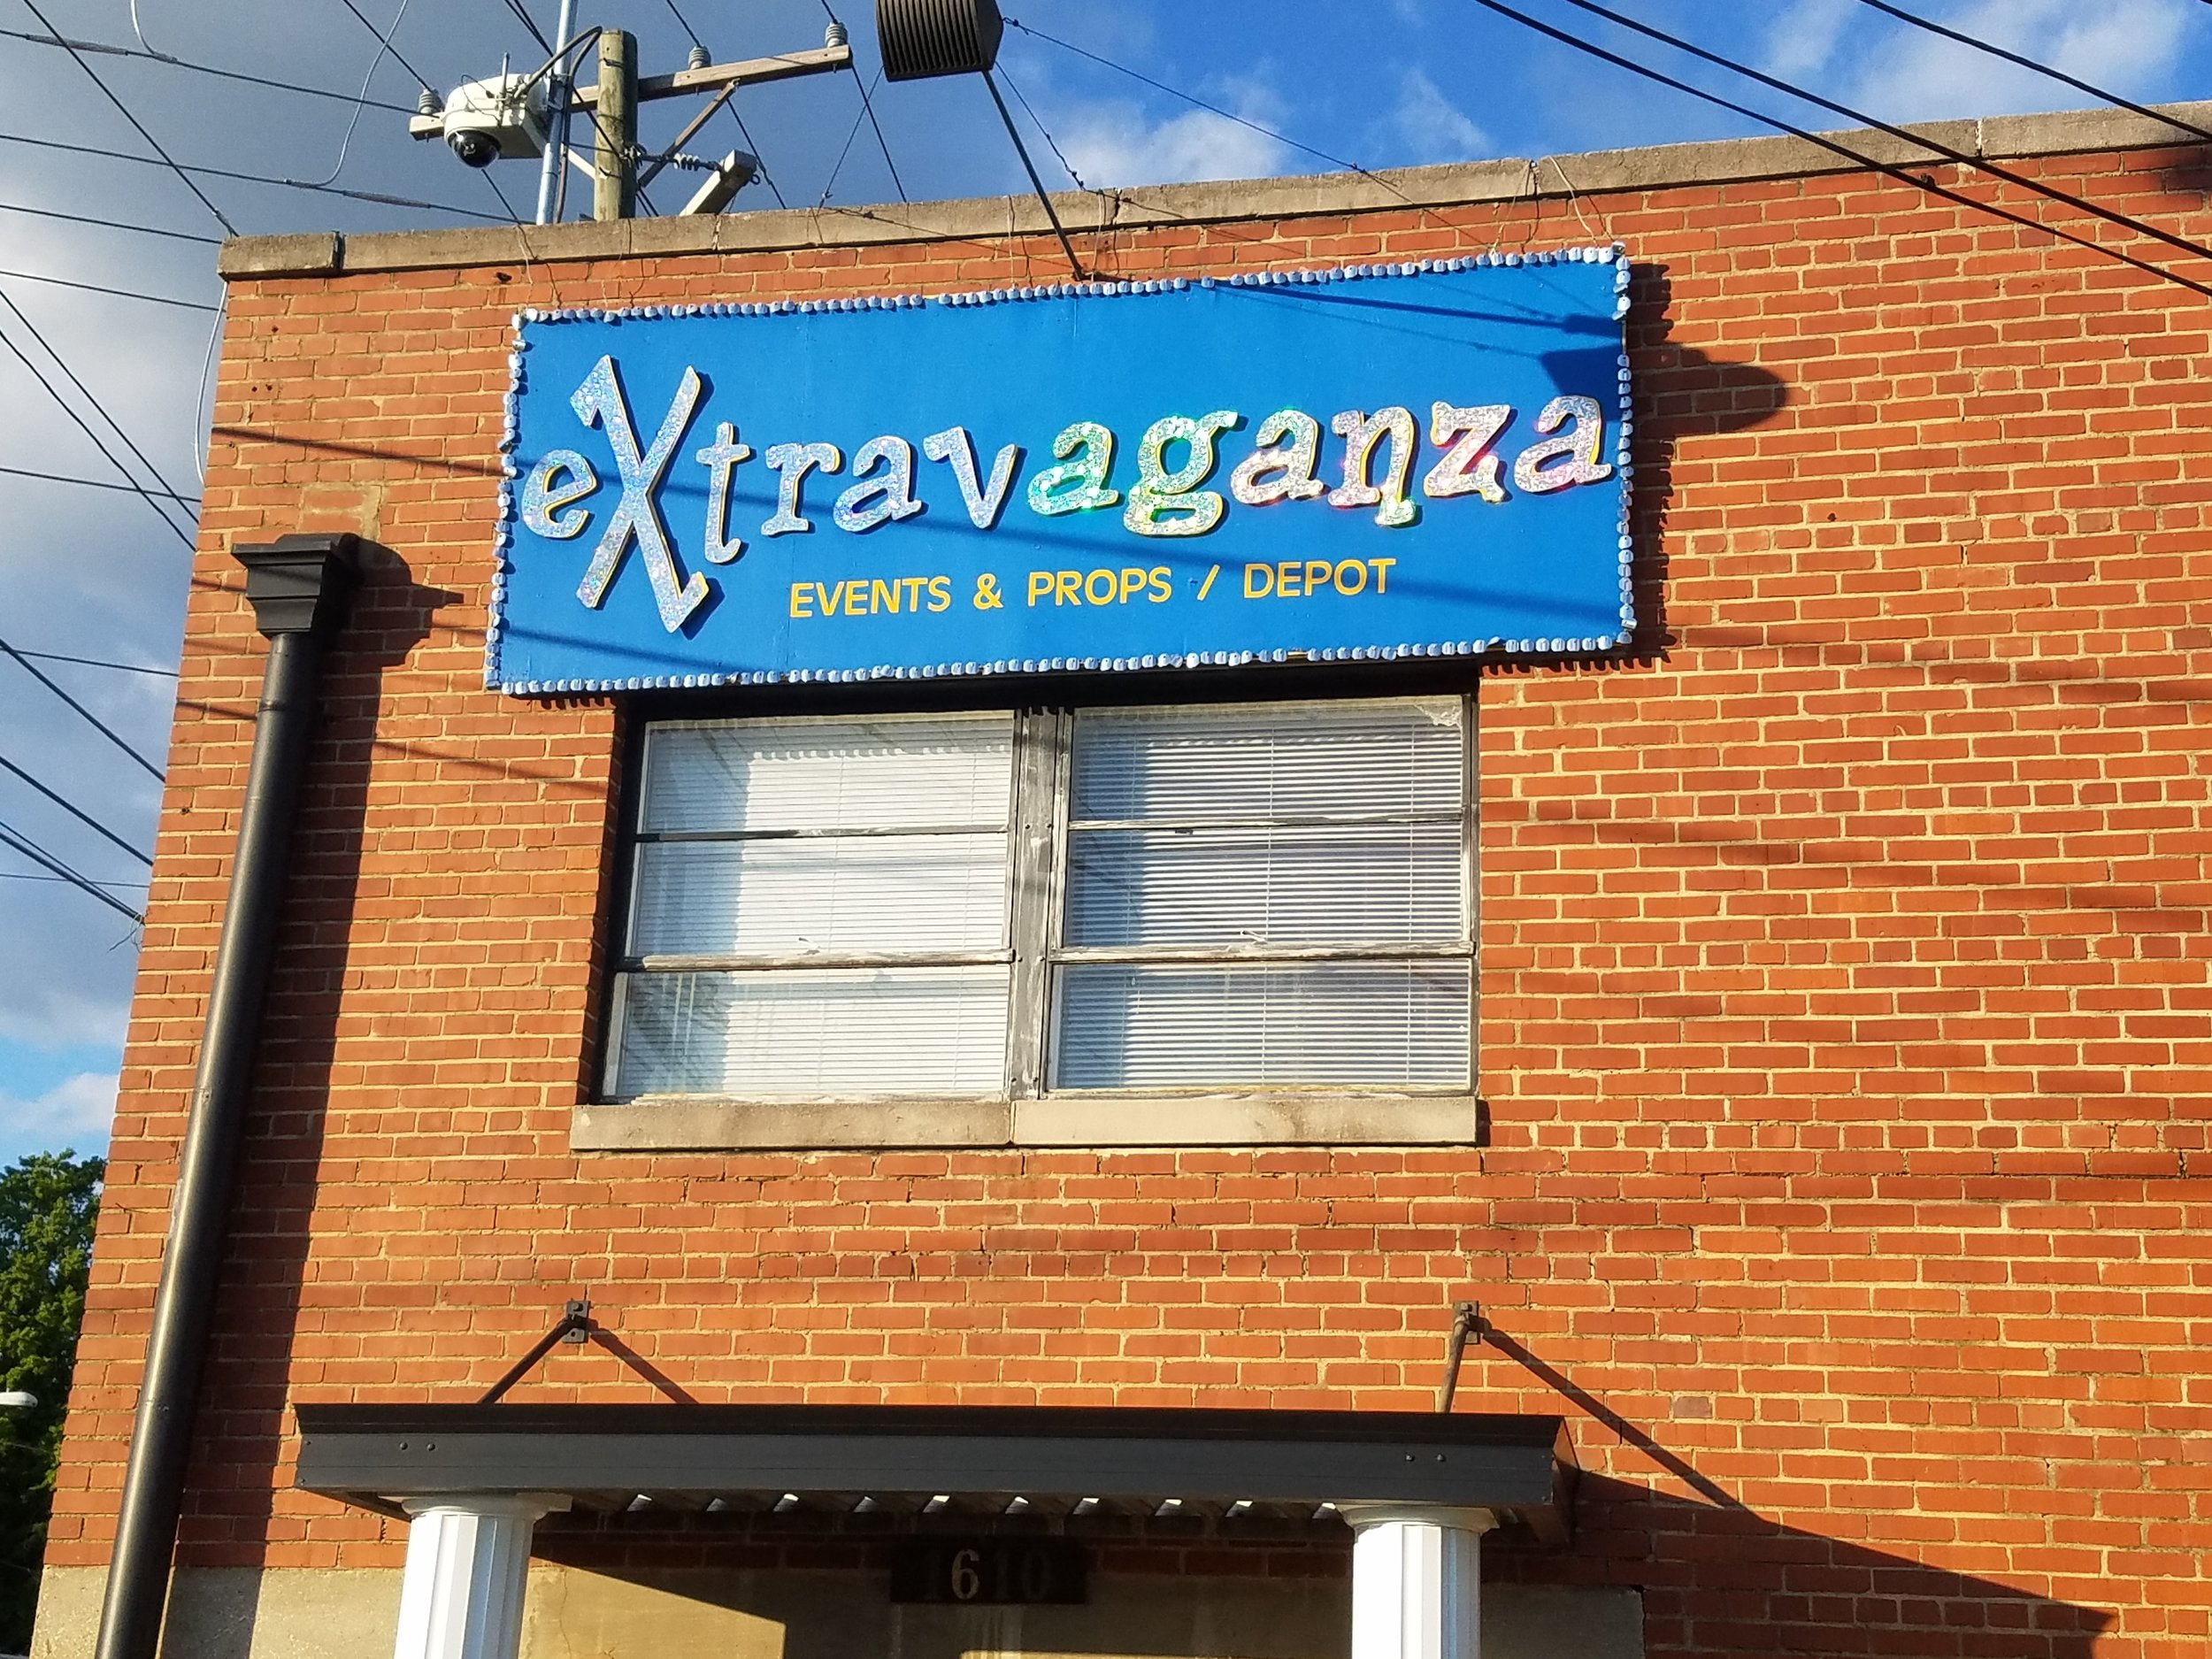 Extravaganza Depot